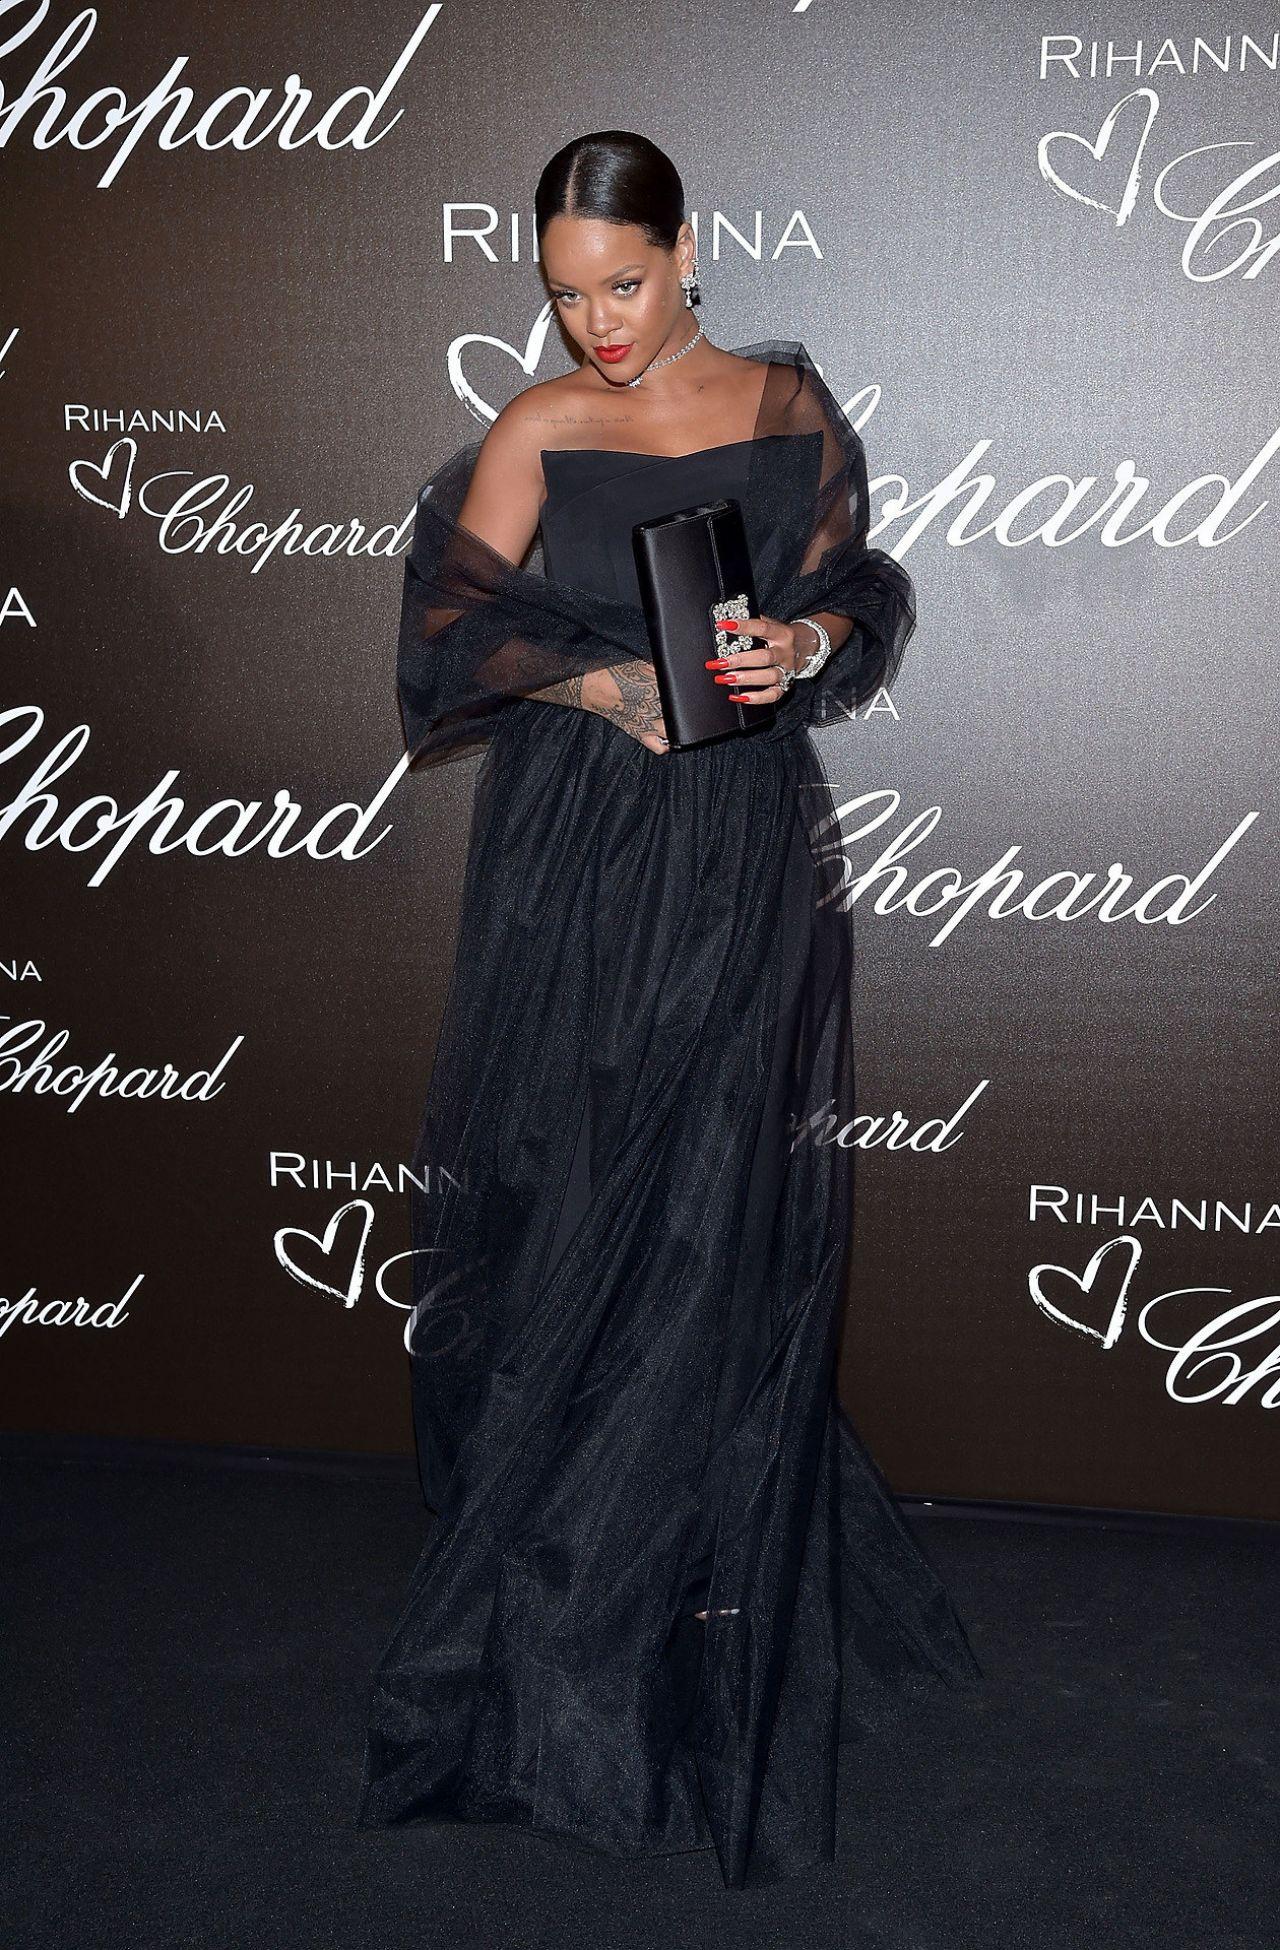 Rihanna At Chopard Dinner Cannes Film Festival 05 18 2017